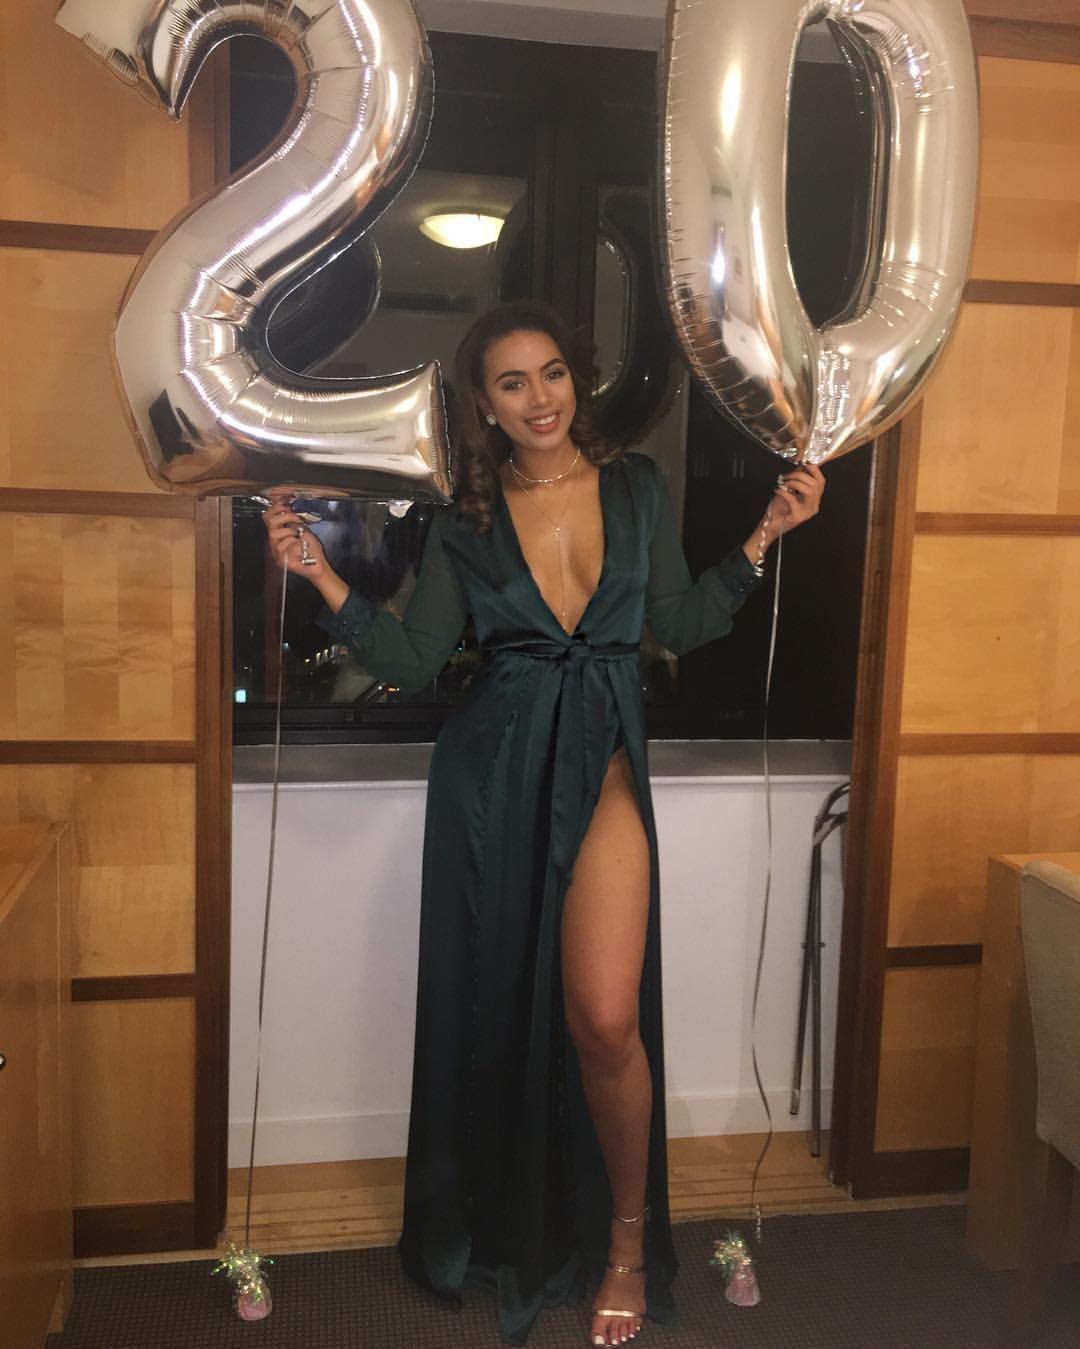 pinwendy katie on birthday girl ️  pinterest